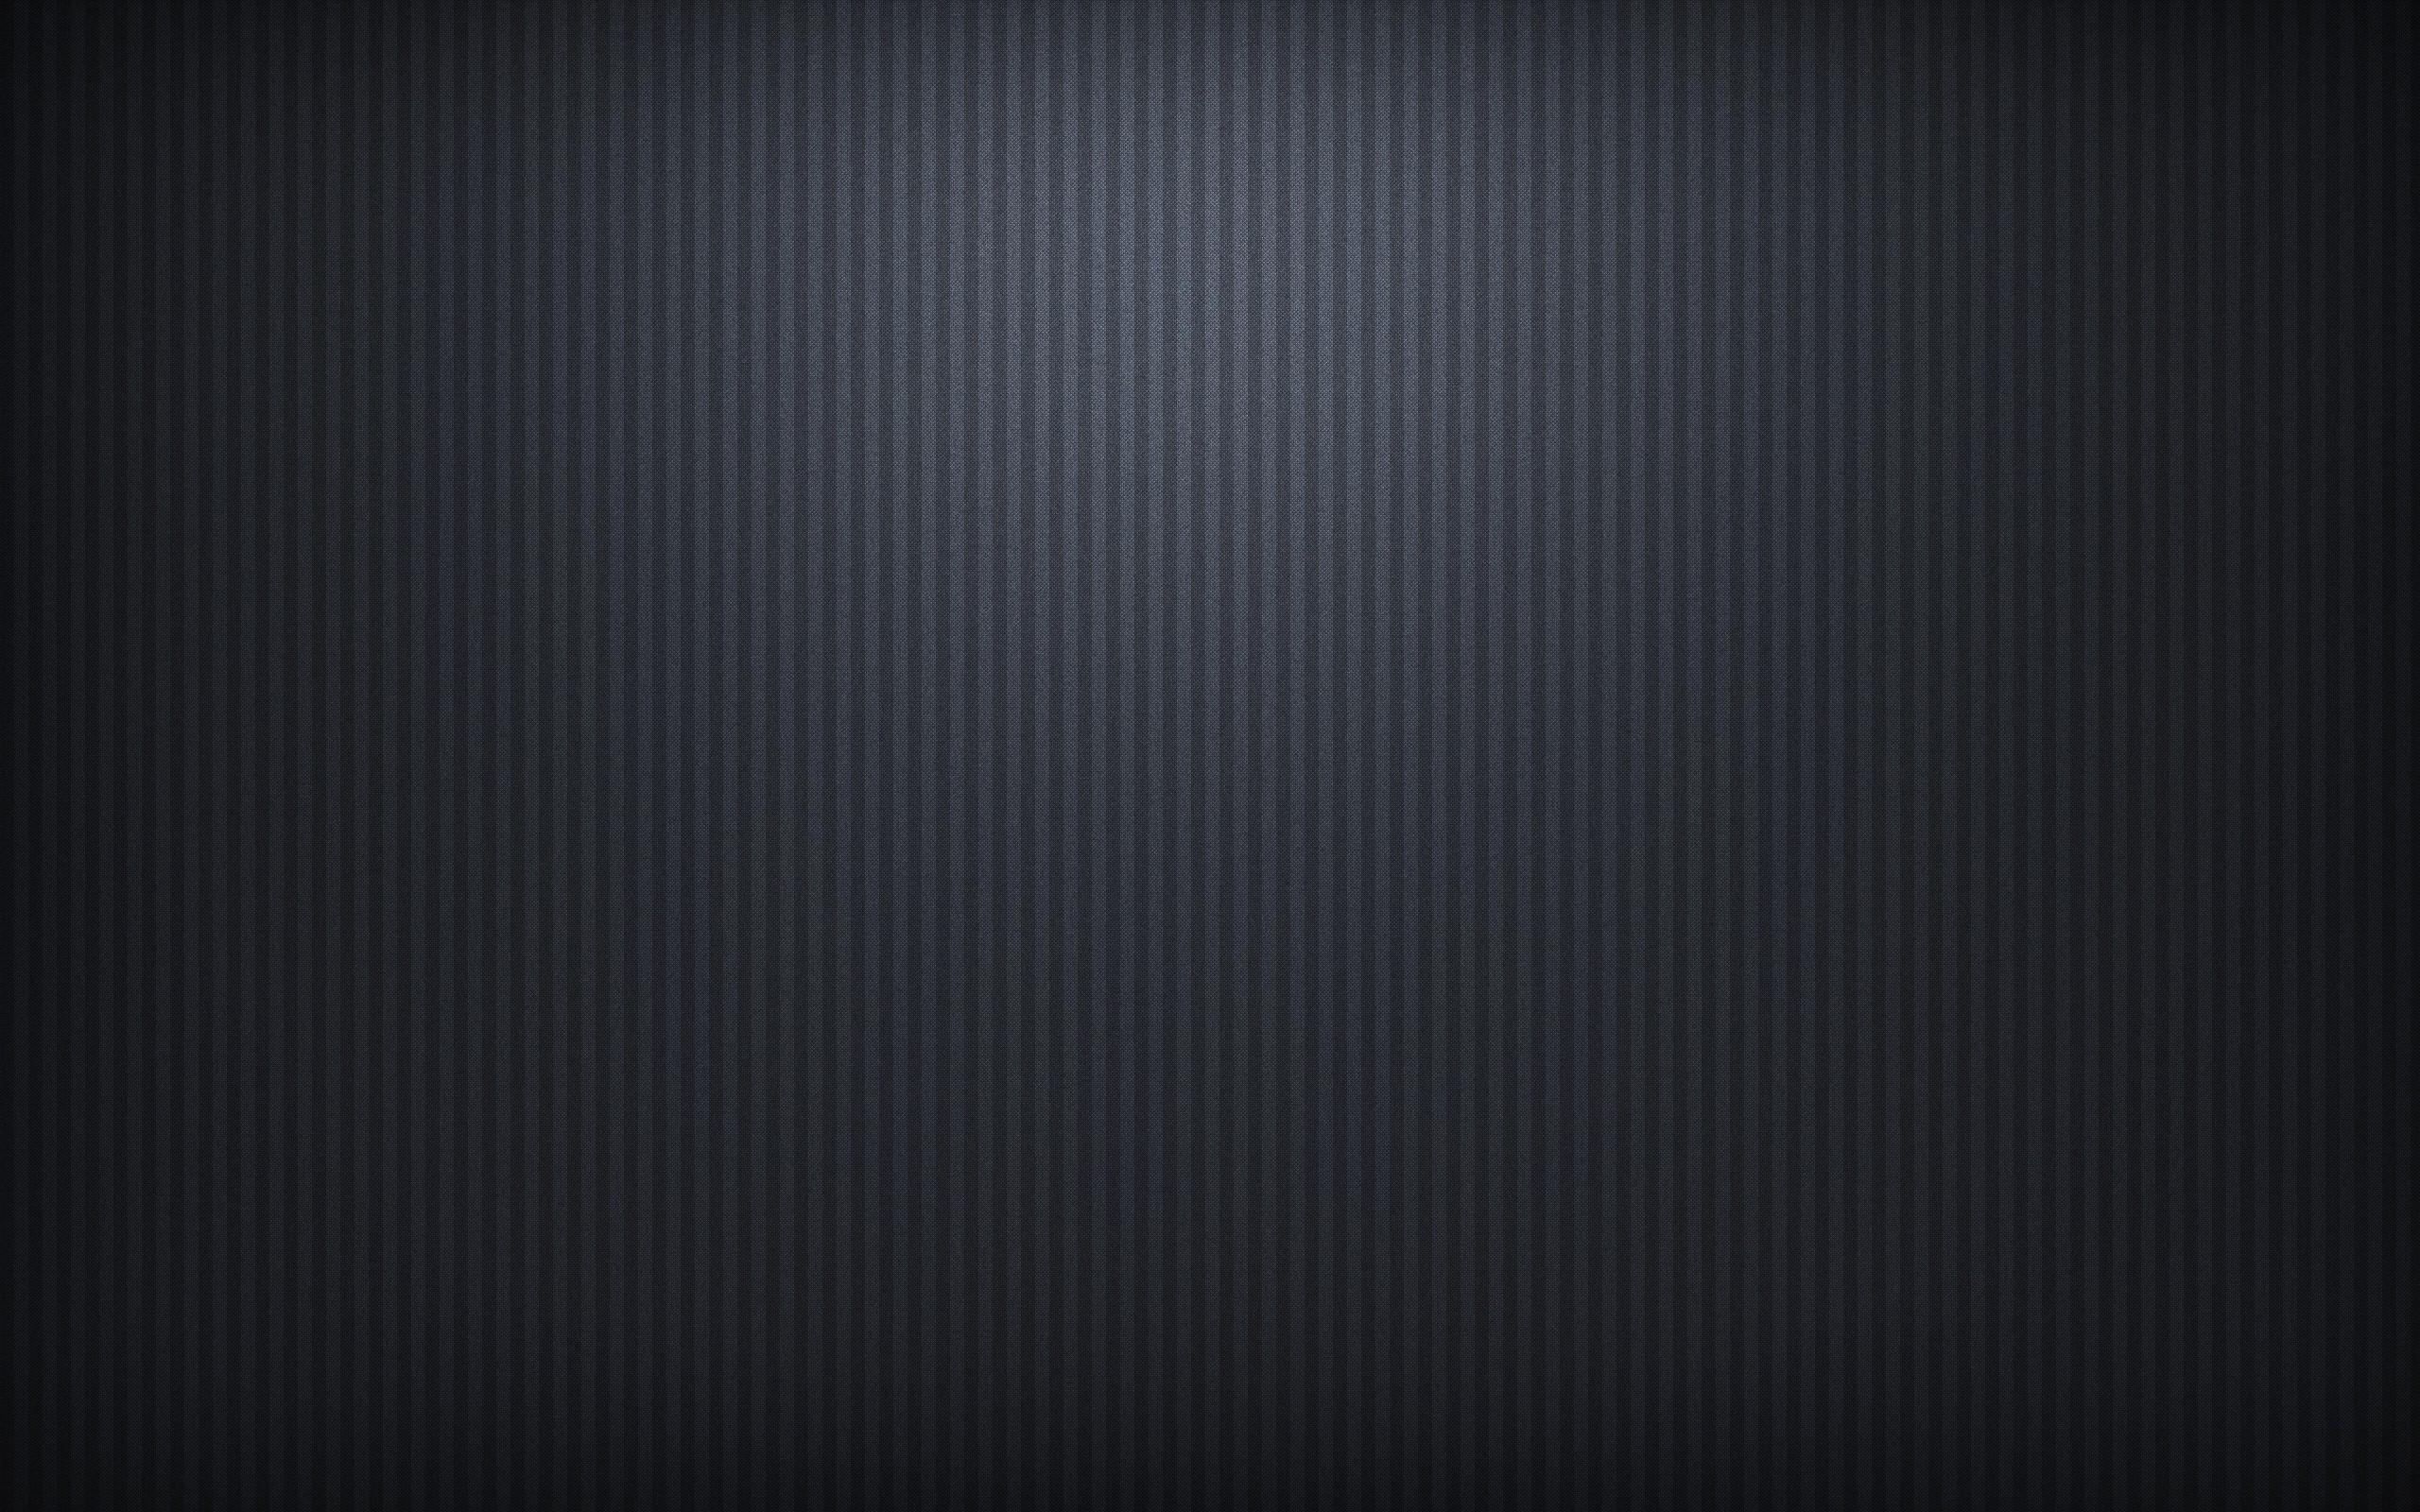 1080x1920 Daredevil Minimalism Iphone 7 6s 6 Plus Pixel: 1080x1920 Texture Abstract Minimalism Iphone 7,6s,6 Plus